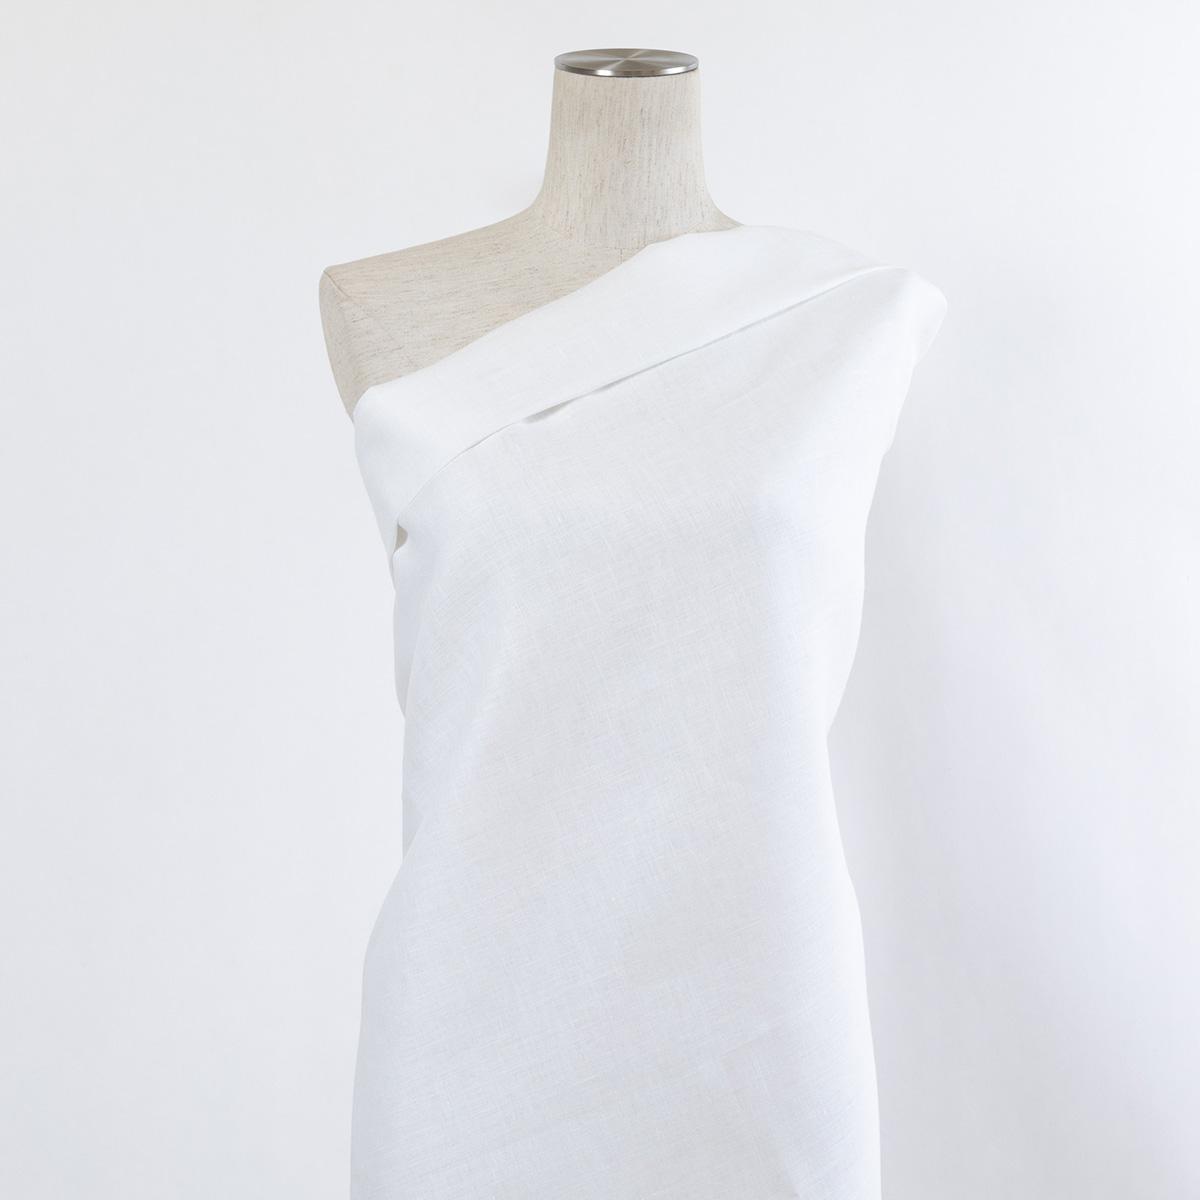 150cm巾 【 リネン 100% 生地 】 ホワイト 無地 普通地 1m単位 R0040 <旧品番 W-040> 【シーツ、ブラウス、チュニックなどに最適】